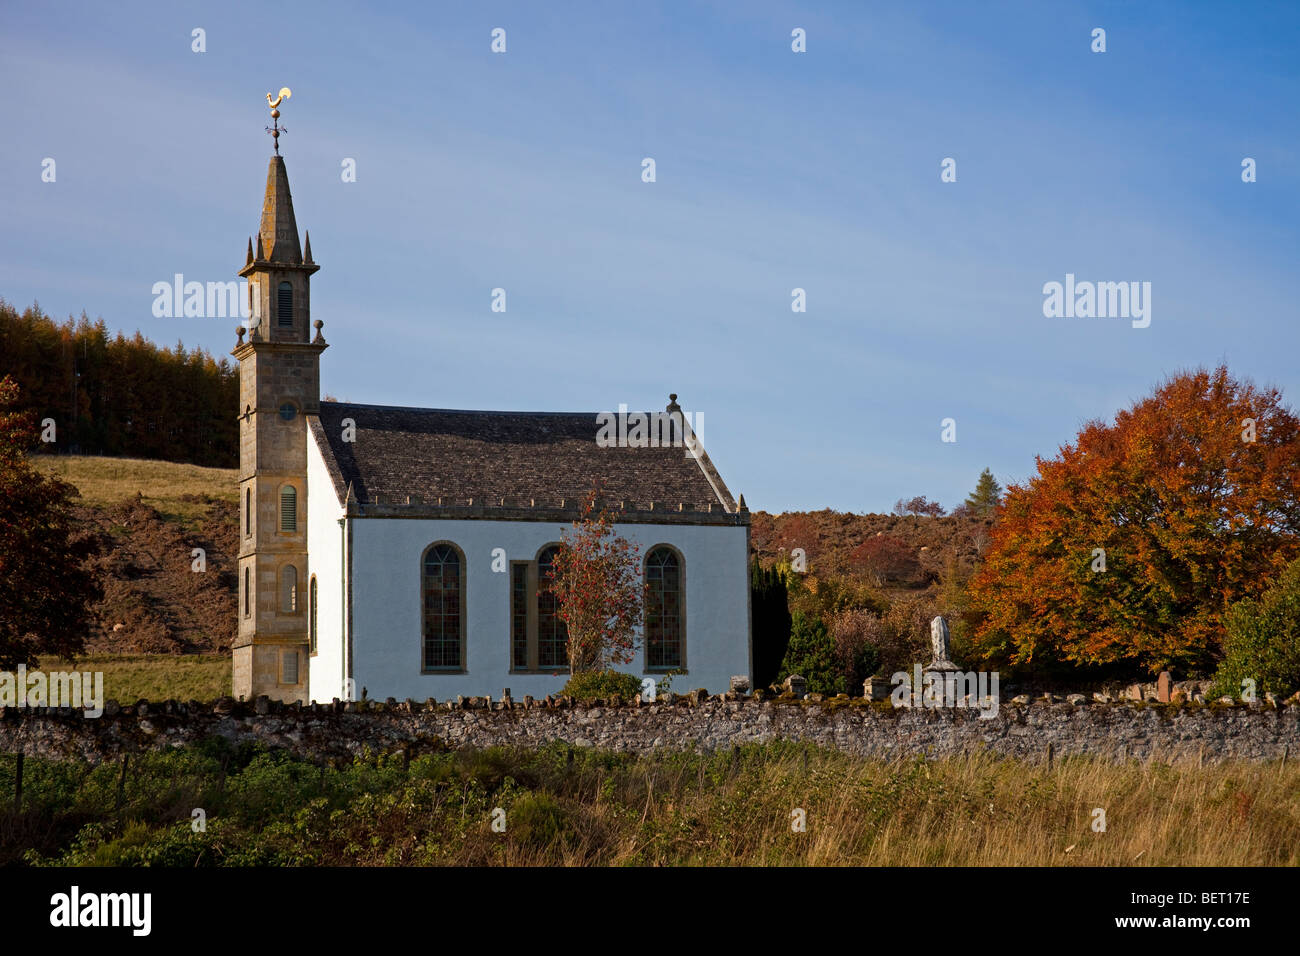 Daviot church, during autumn season Inverness-shire, Scotland UK, Europe - Stock Image